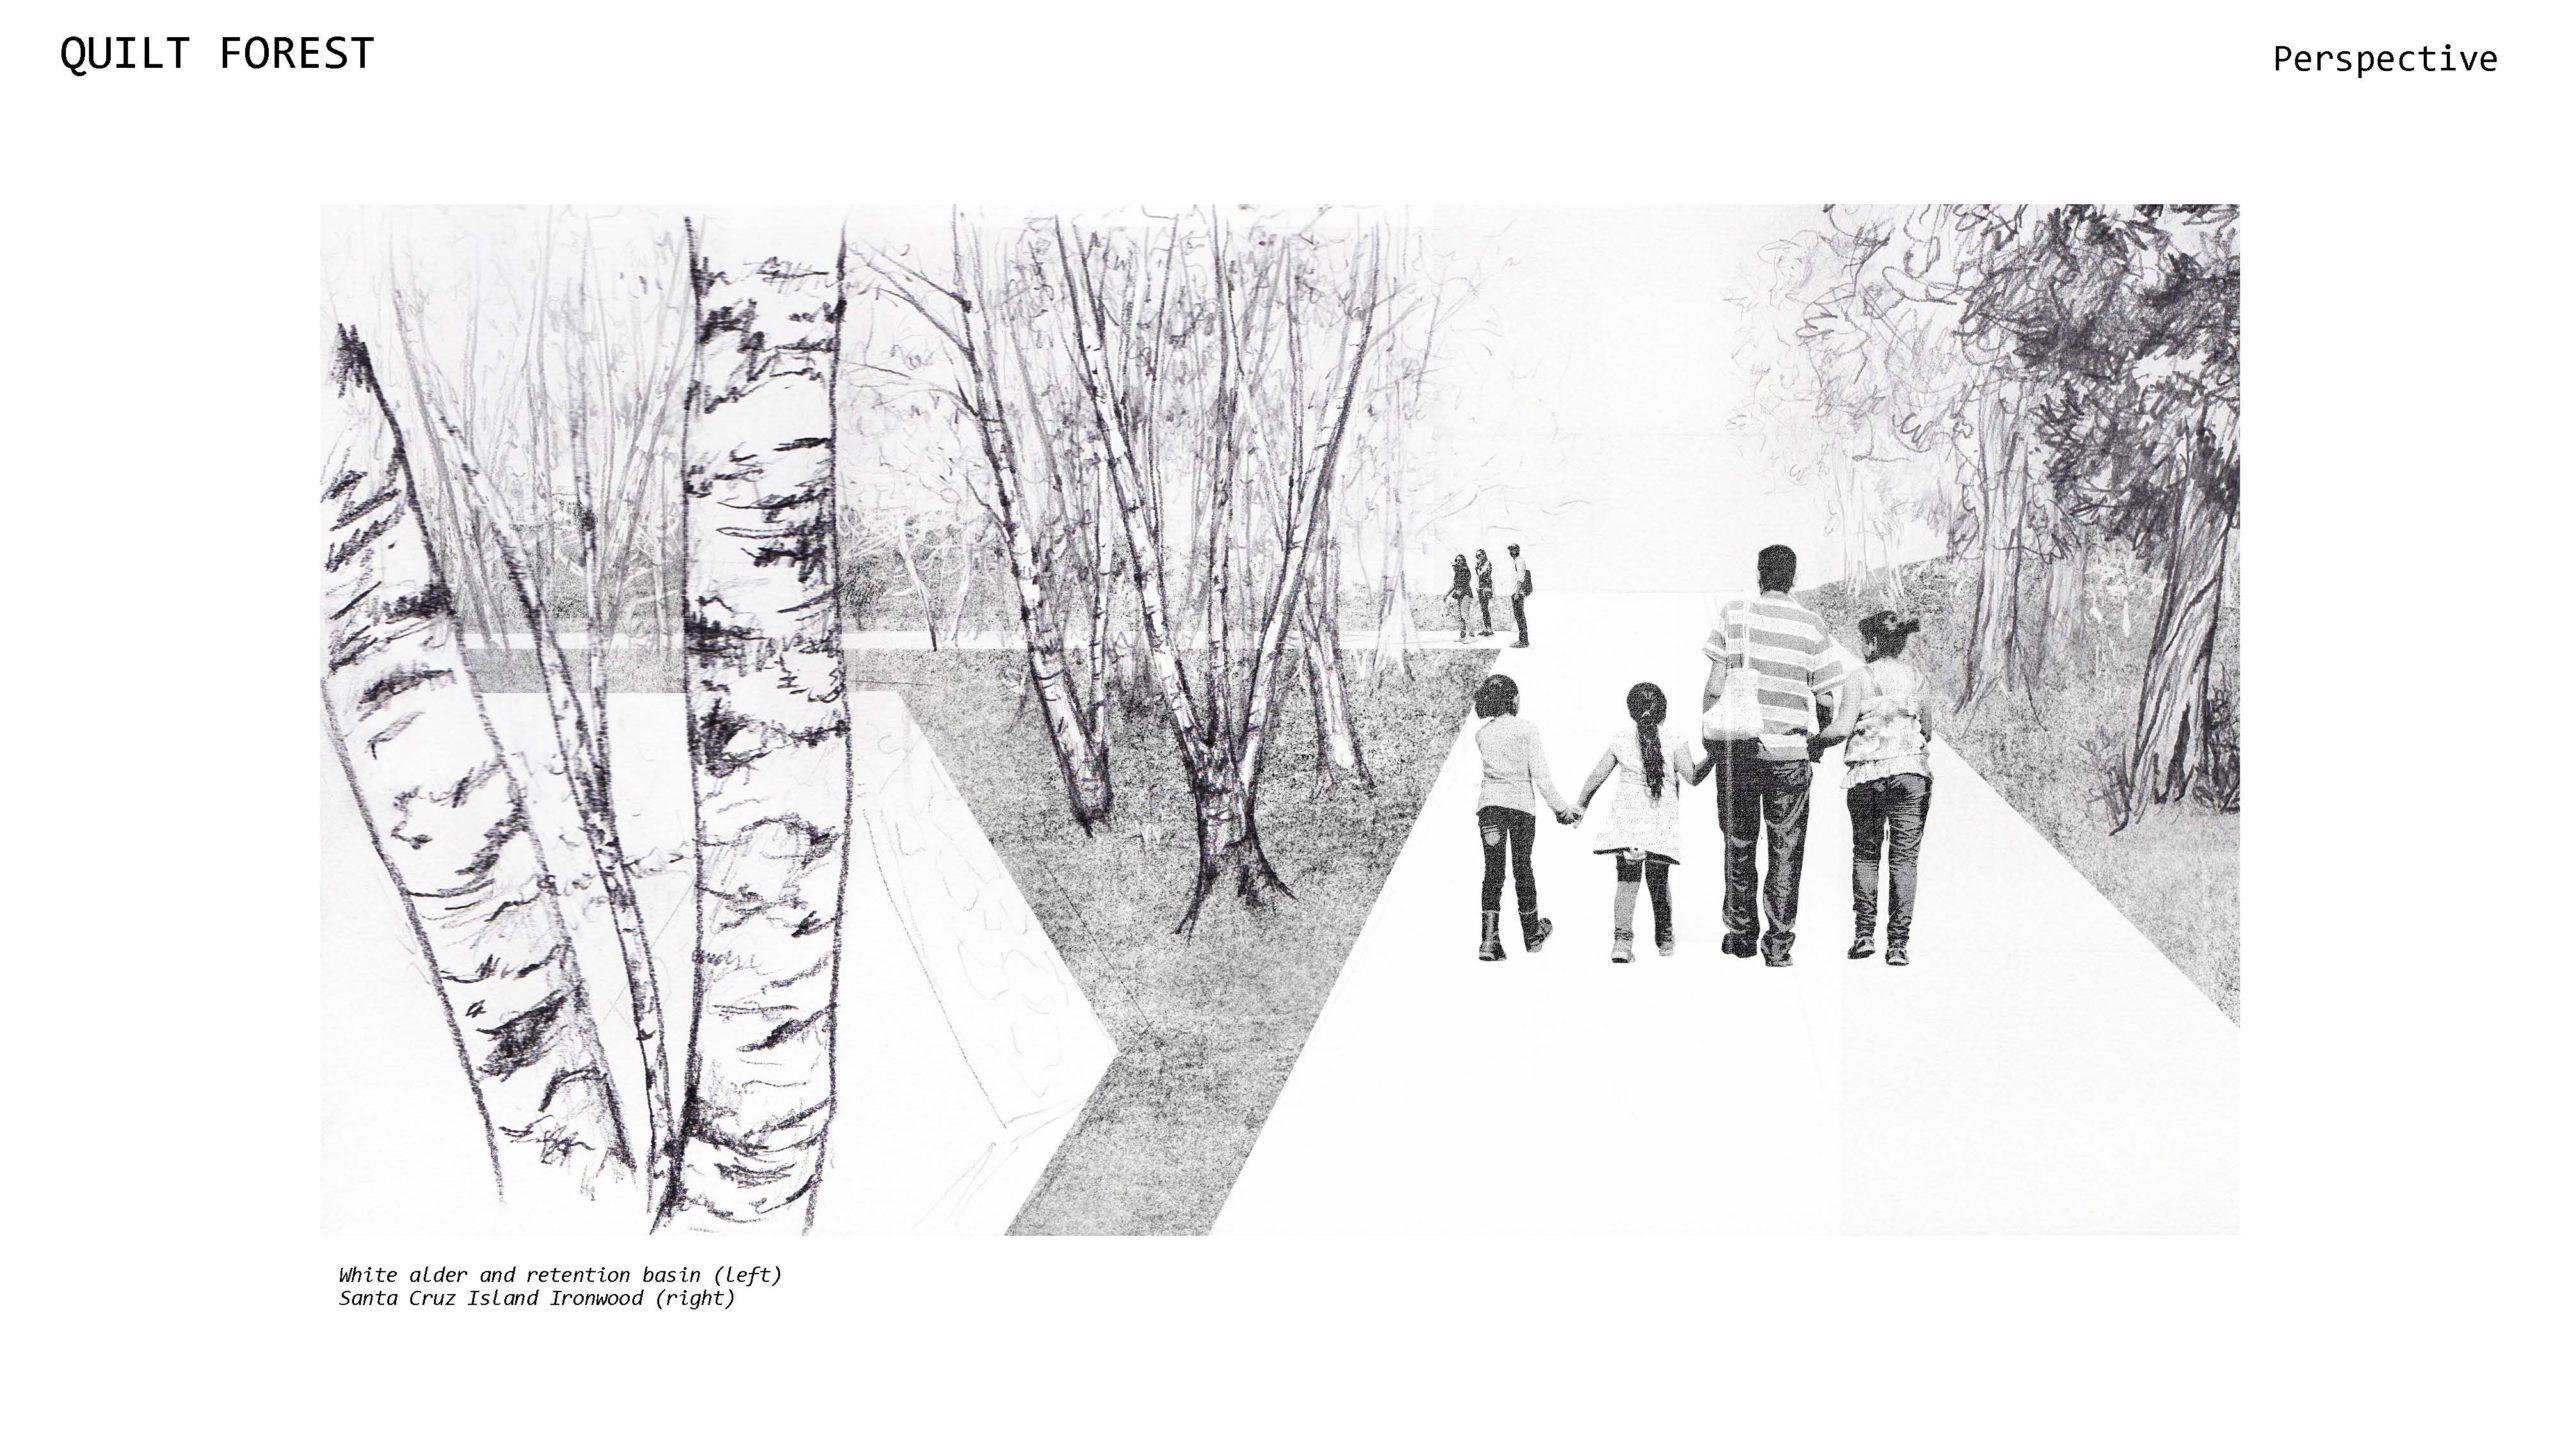 Quilt Forest - Andrea Binz, MLA+3 '22